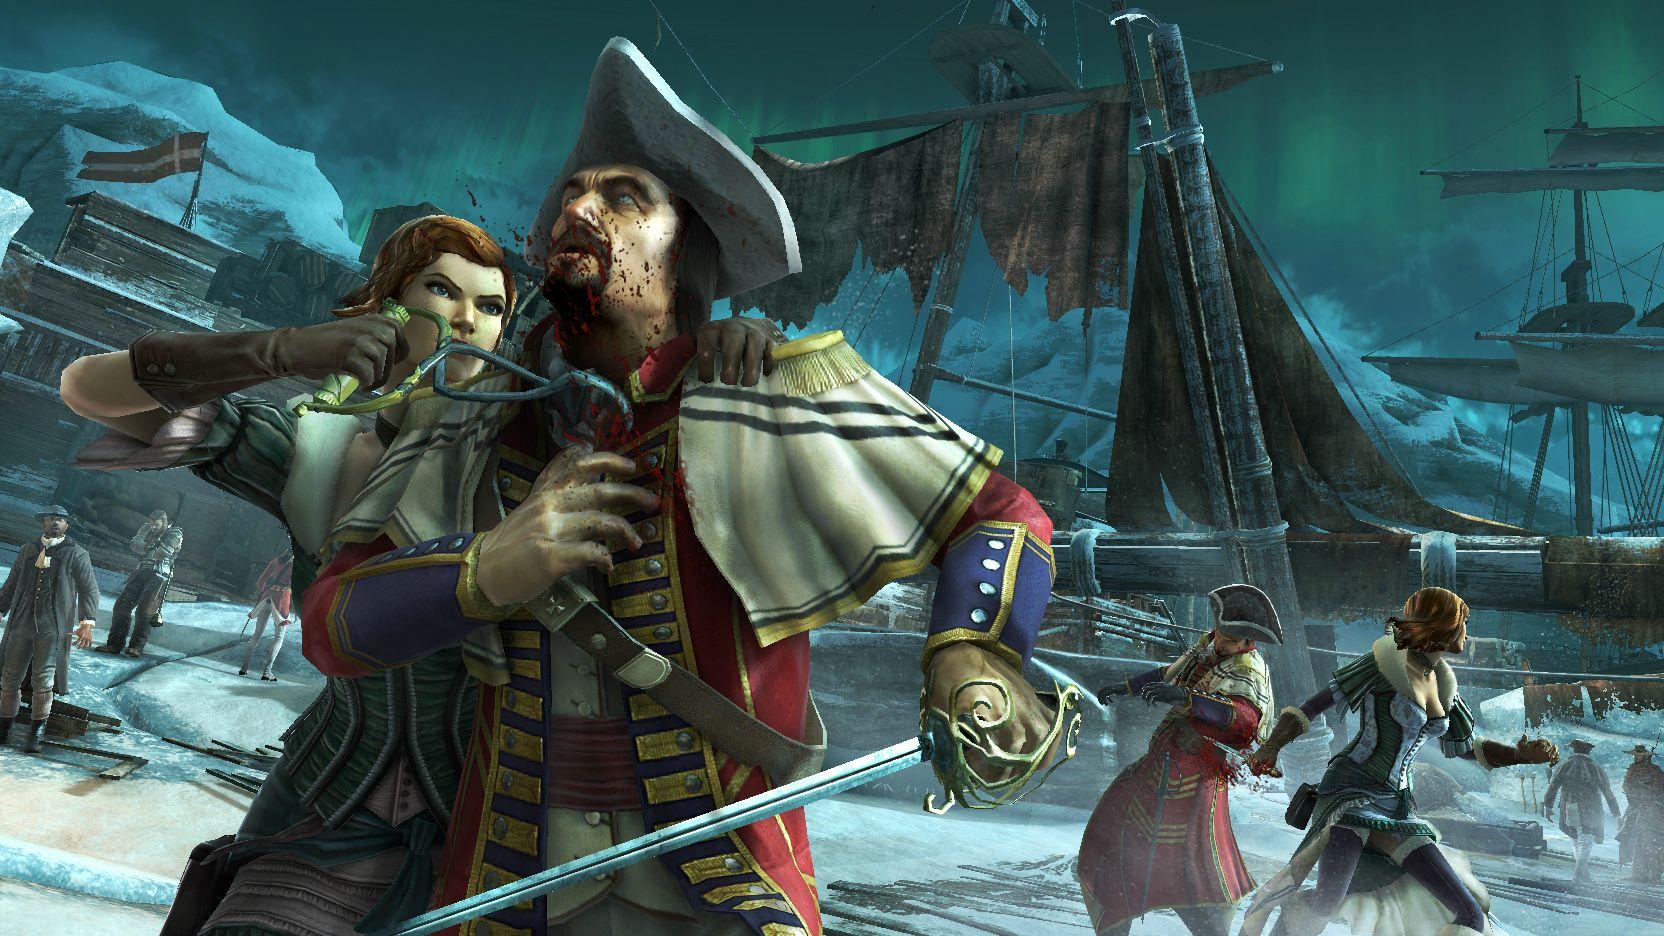 Komentovaná procházka Bostonem v Assassin's Creed 3 68053